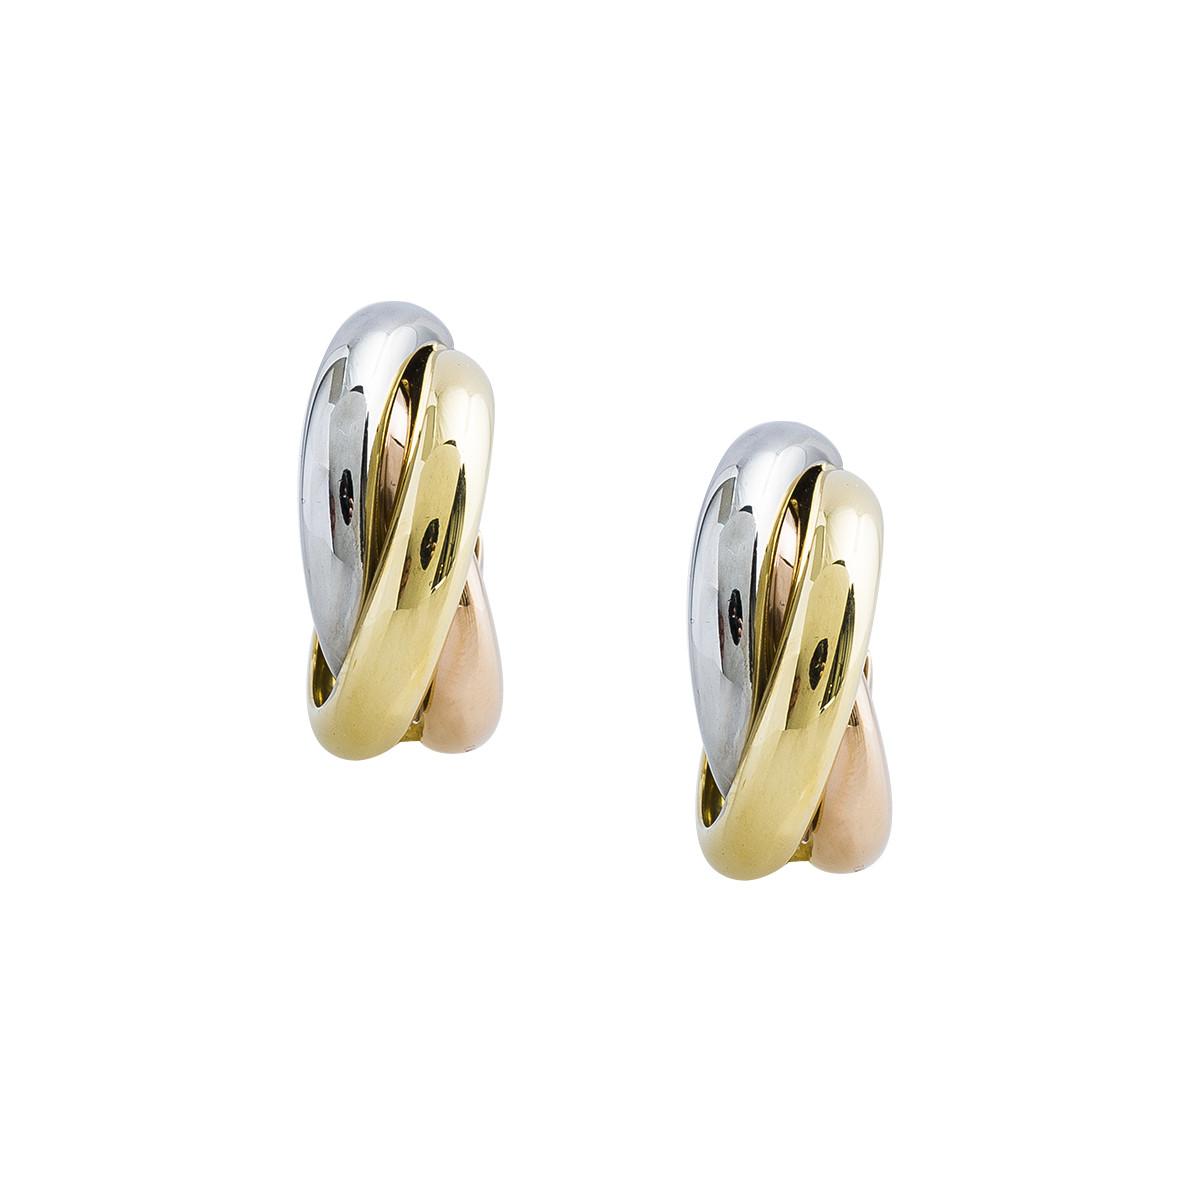 Vintage Cartier Trinity De Cartier Hoop Earrings